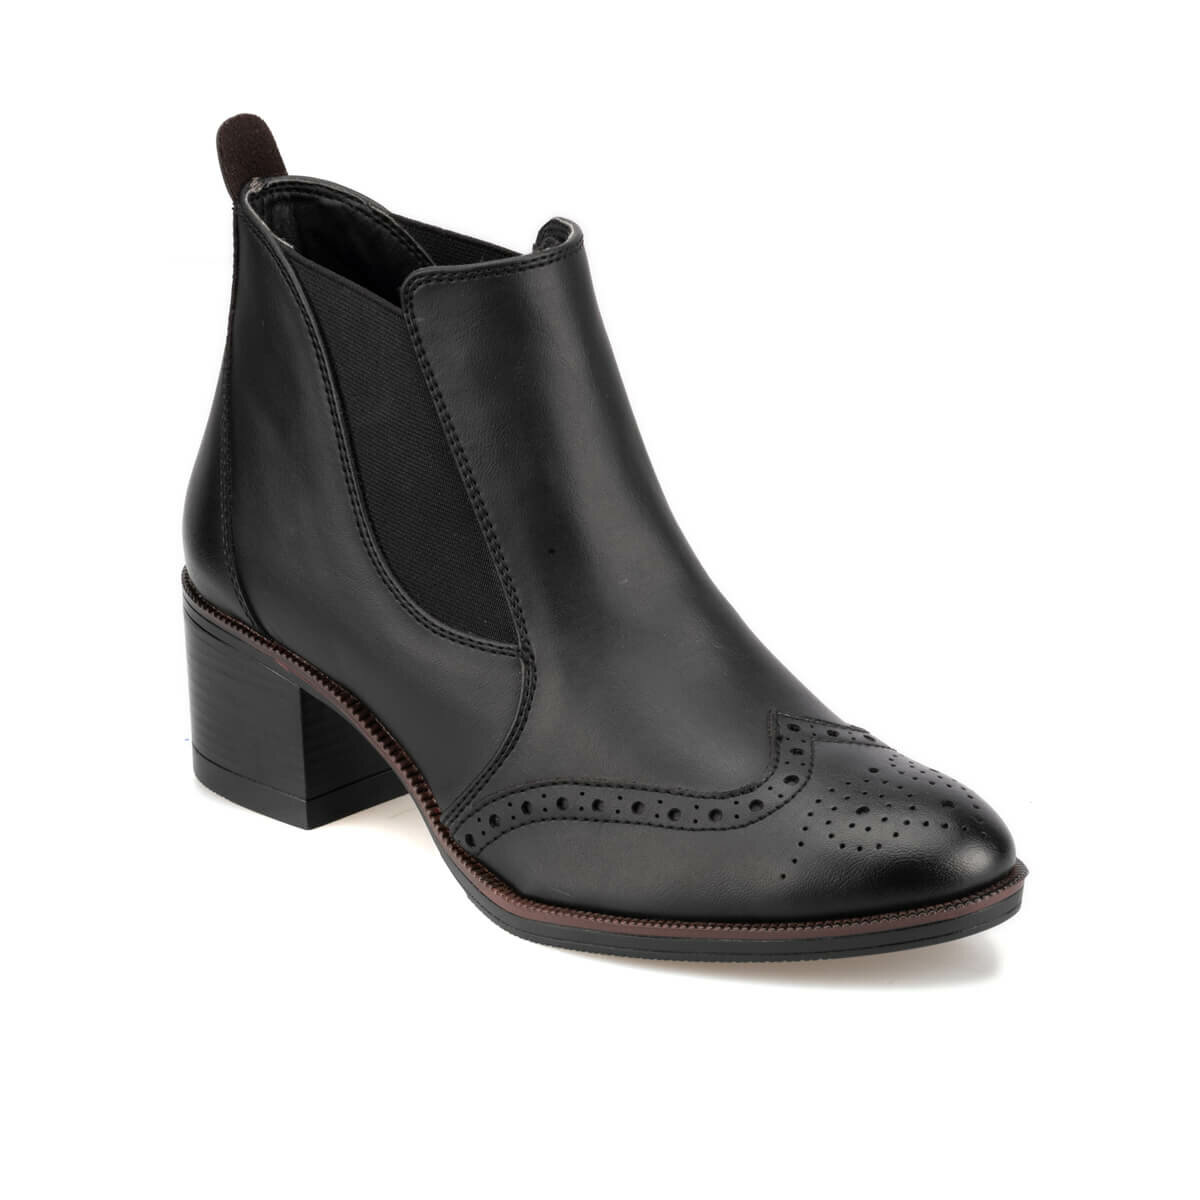 FLO 92.309380.Z أحذية نسائية سوداء بولاريس